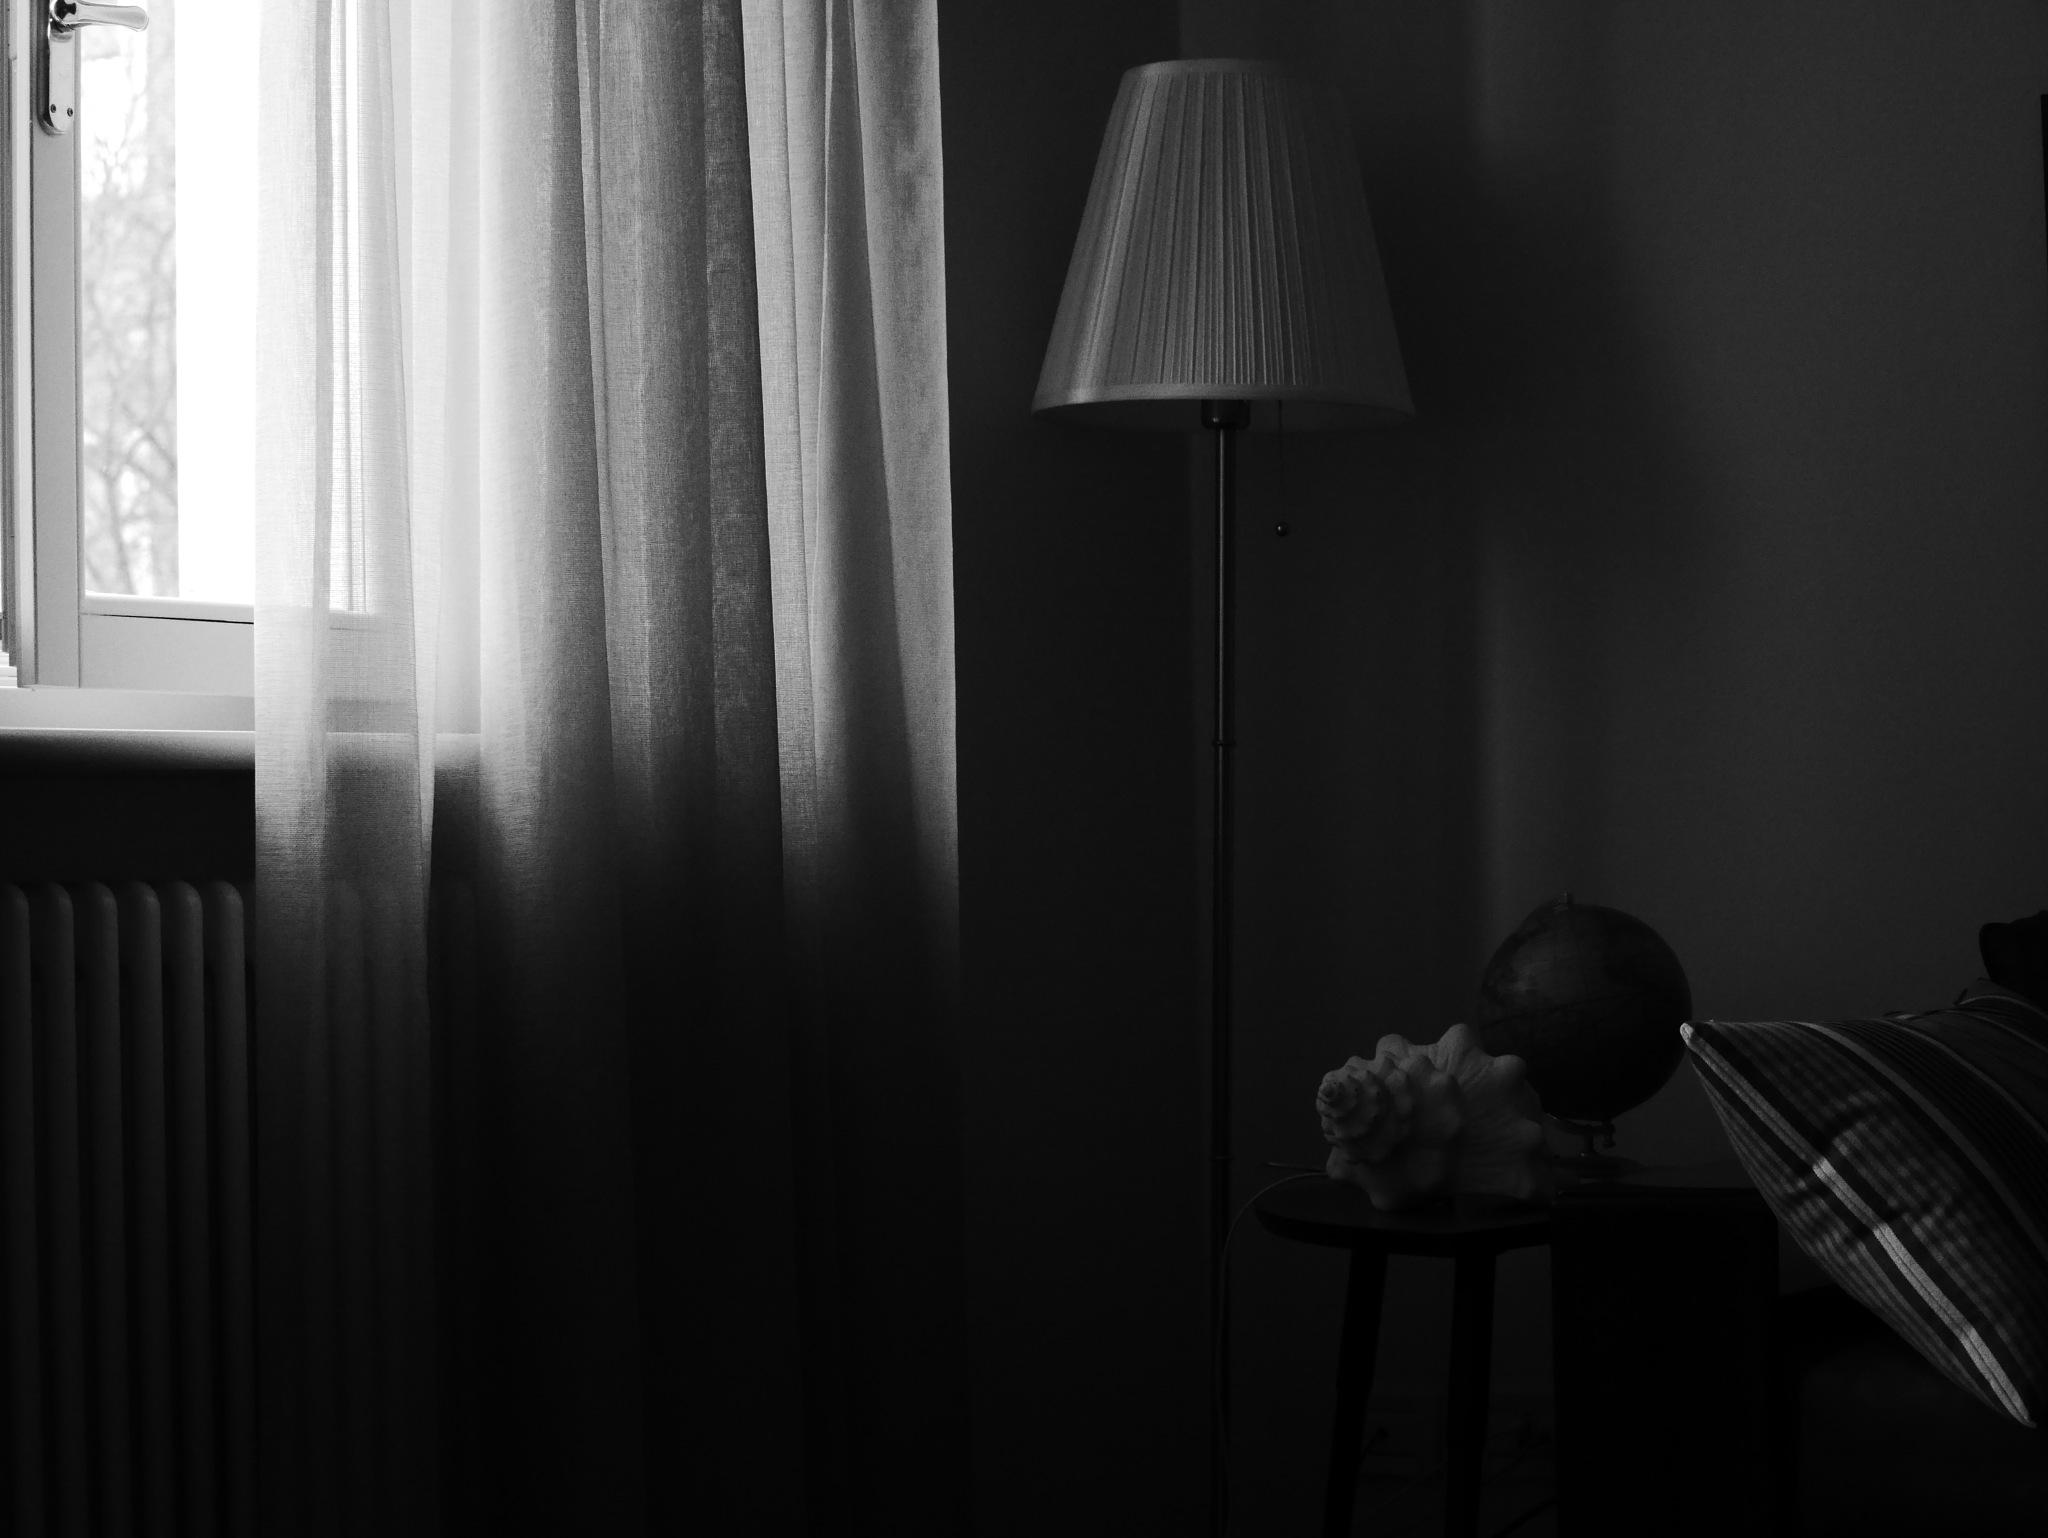 Mistery Room by Mau056